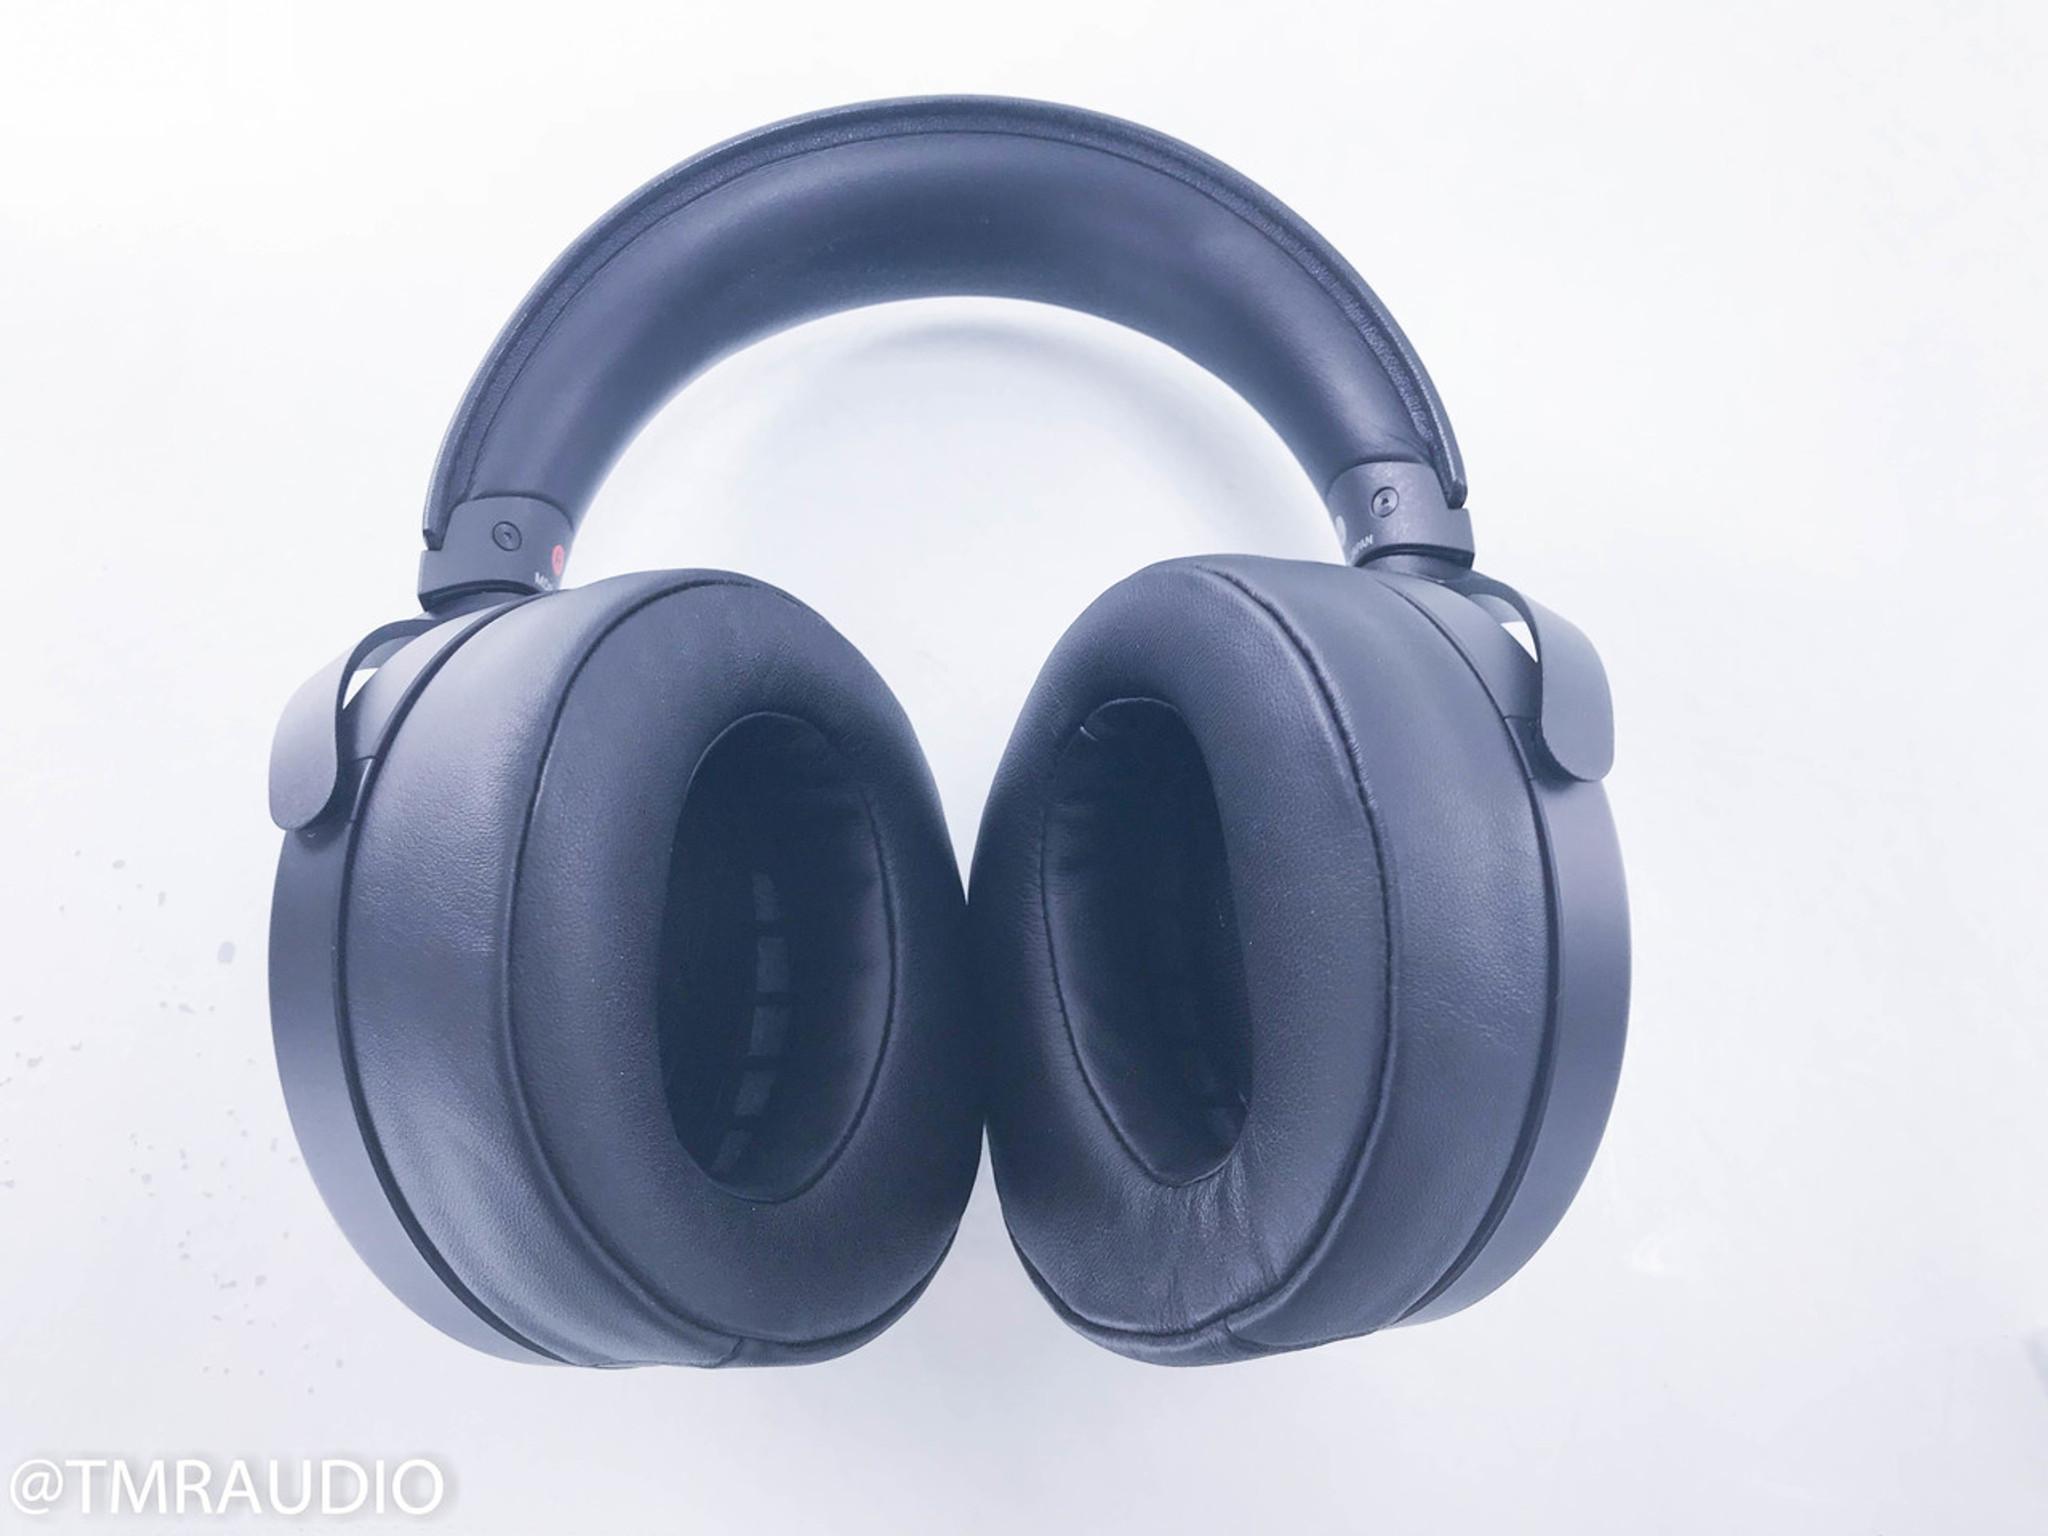 d1c55eba4a1 Sony MDR-Z1R Over-Ear Headphones; Signature Series - The Music Room